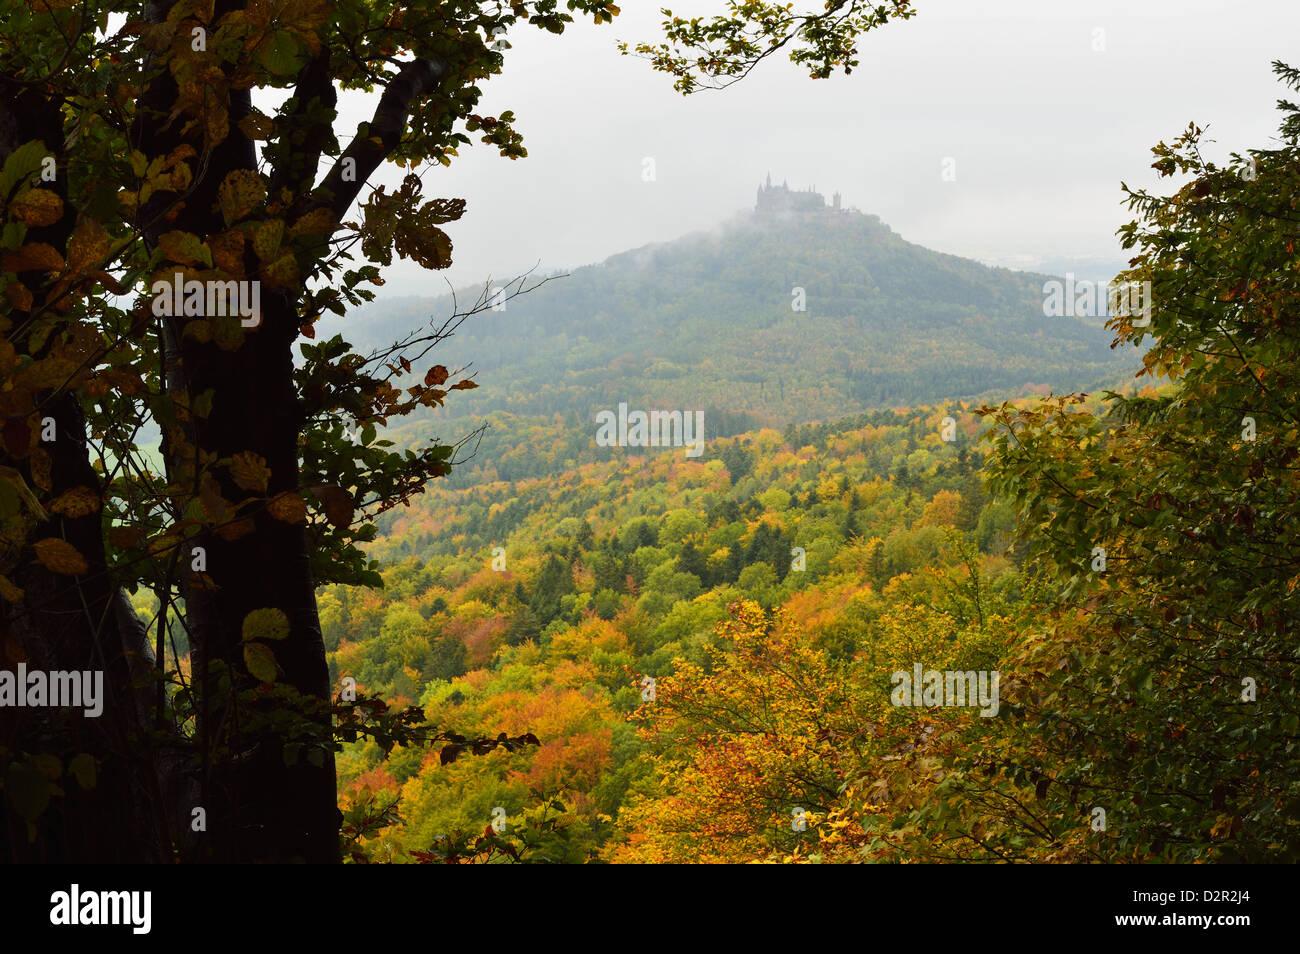 Hohenzollern castle, Swabian Alb, Baden-Wurttemberg, Germany, Europe - Stock Image